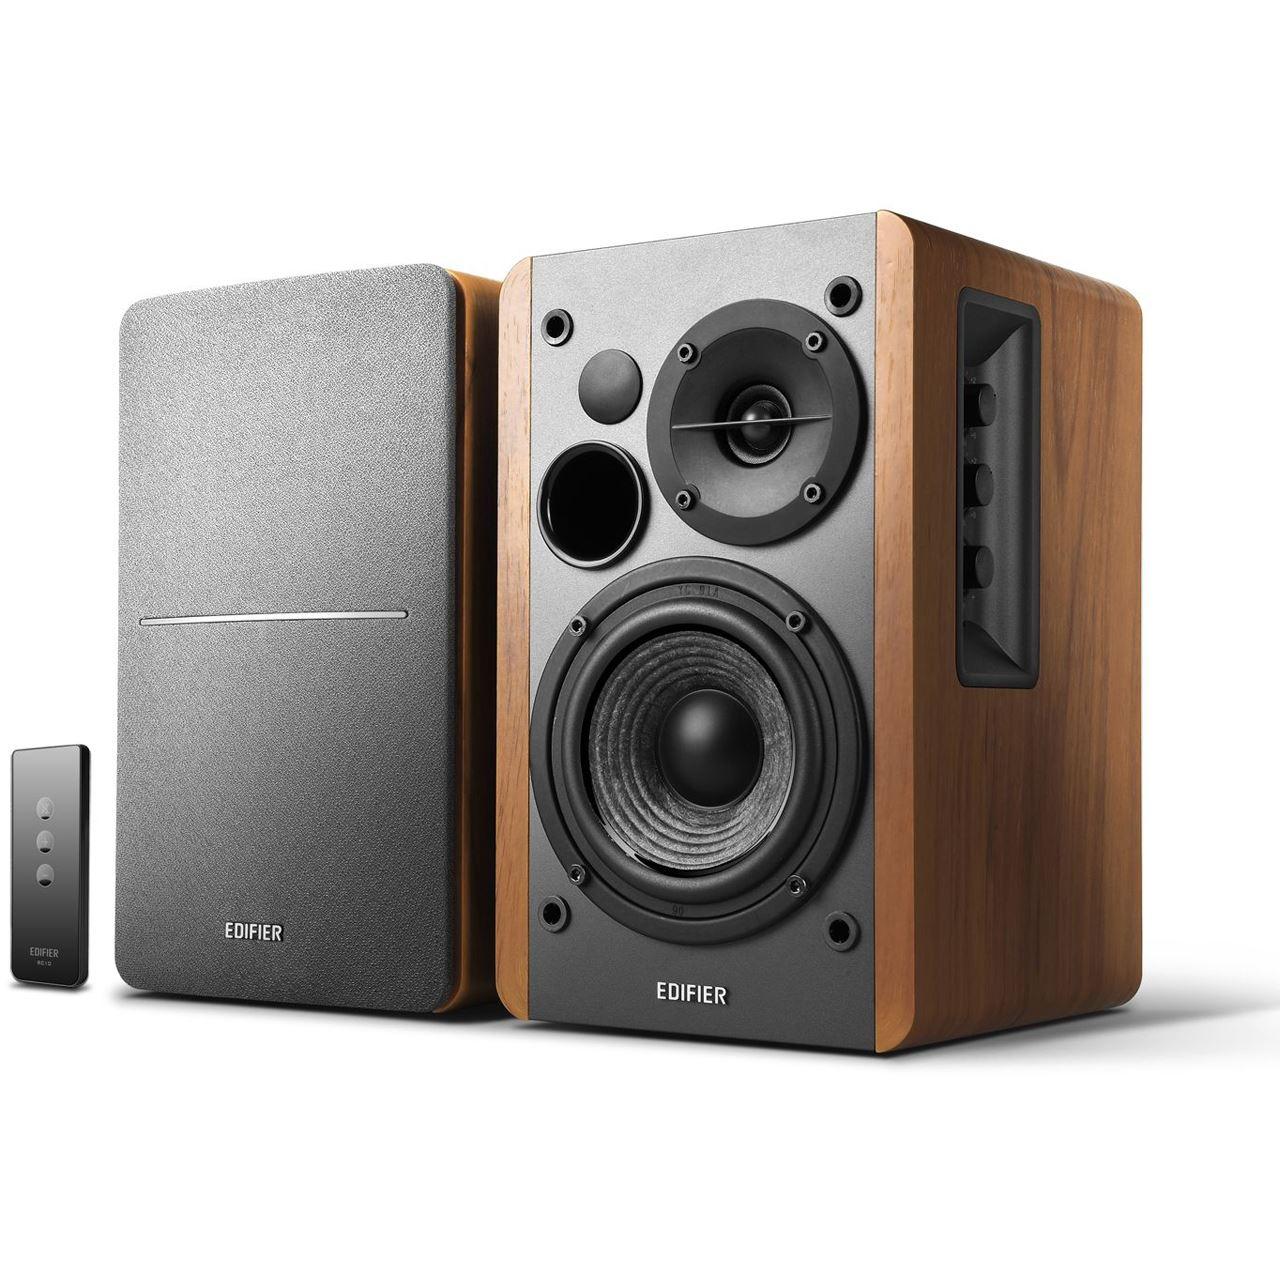 Edifier Studio R1280T (2.0-Soundsystem, 42 Watt) und Edifier Studio R1700BT (2.0, 66 W, Bluetooth) @ Mindfactory